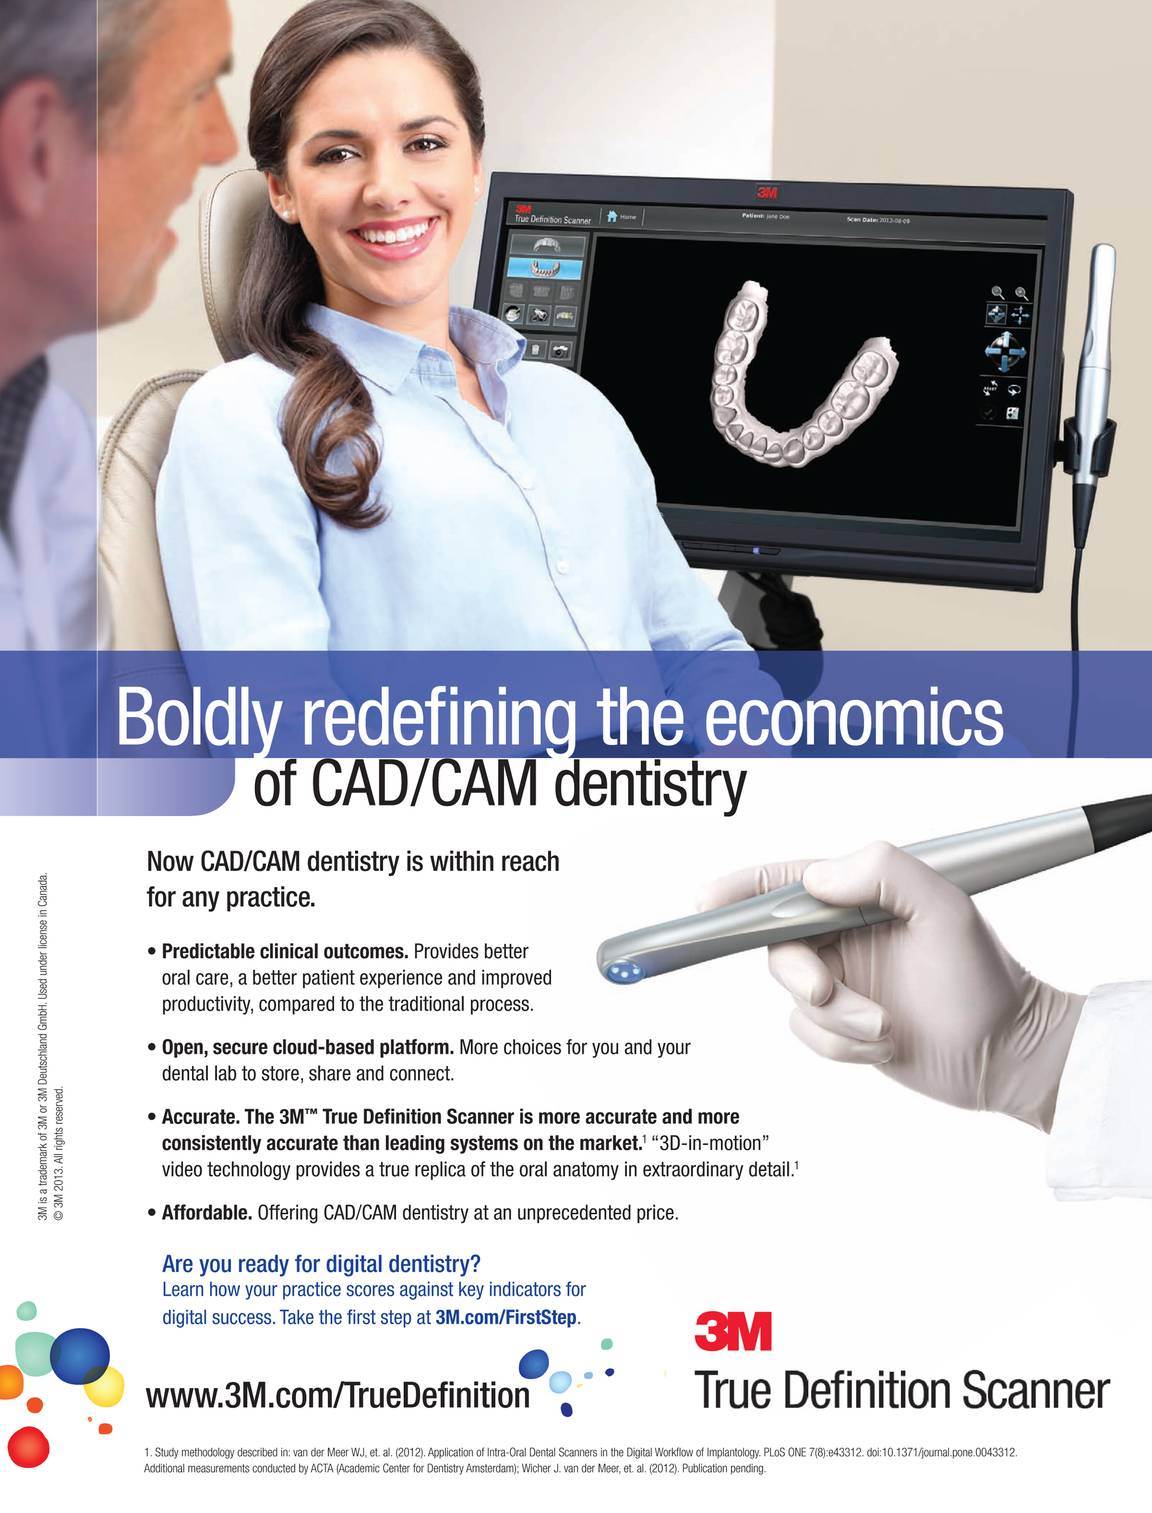 Dental Economics - February 2013 - page 88